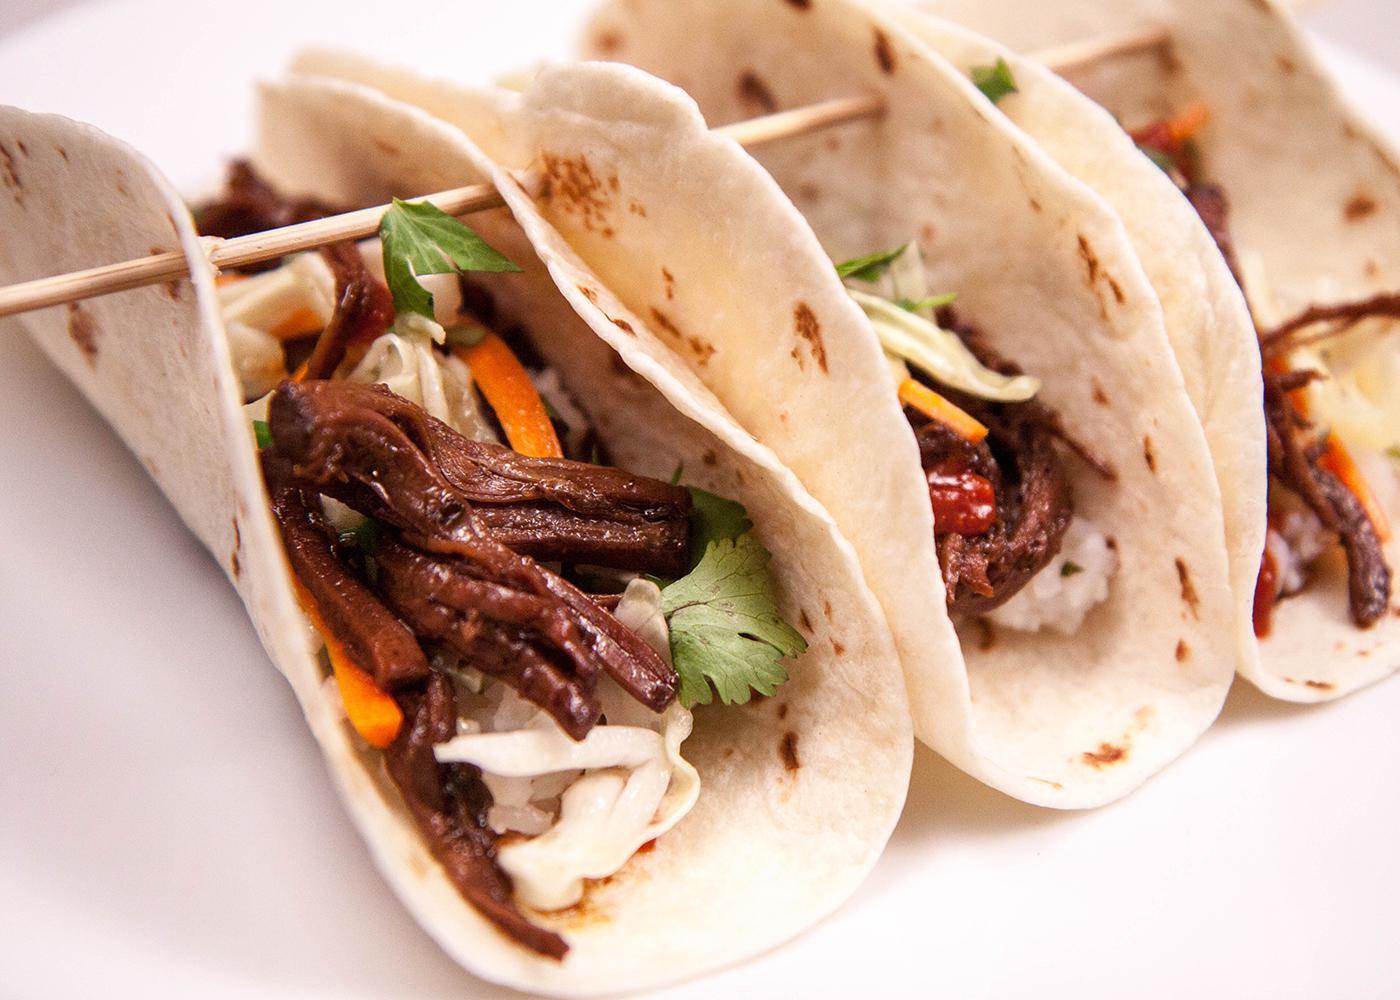 Dads_on_Grills–Korean_Bison_Short_Rib_Tacos.jpg